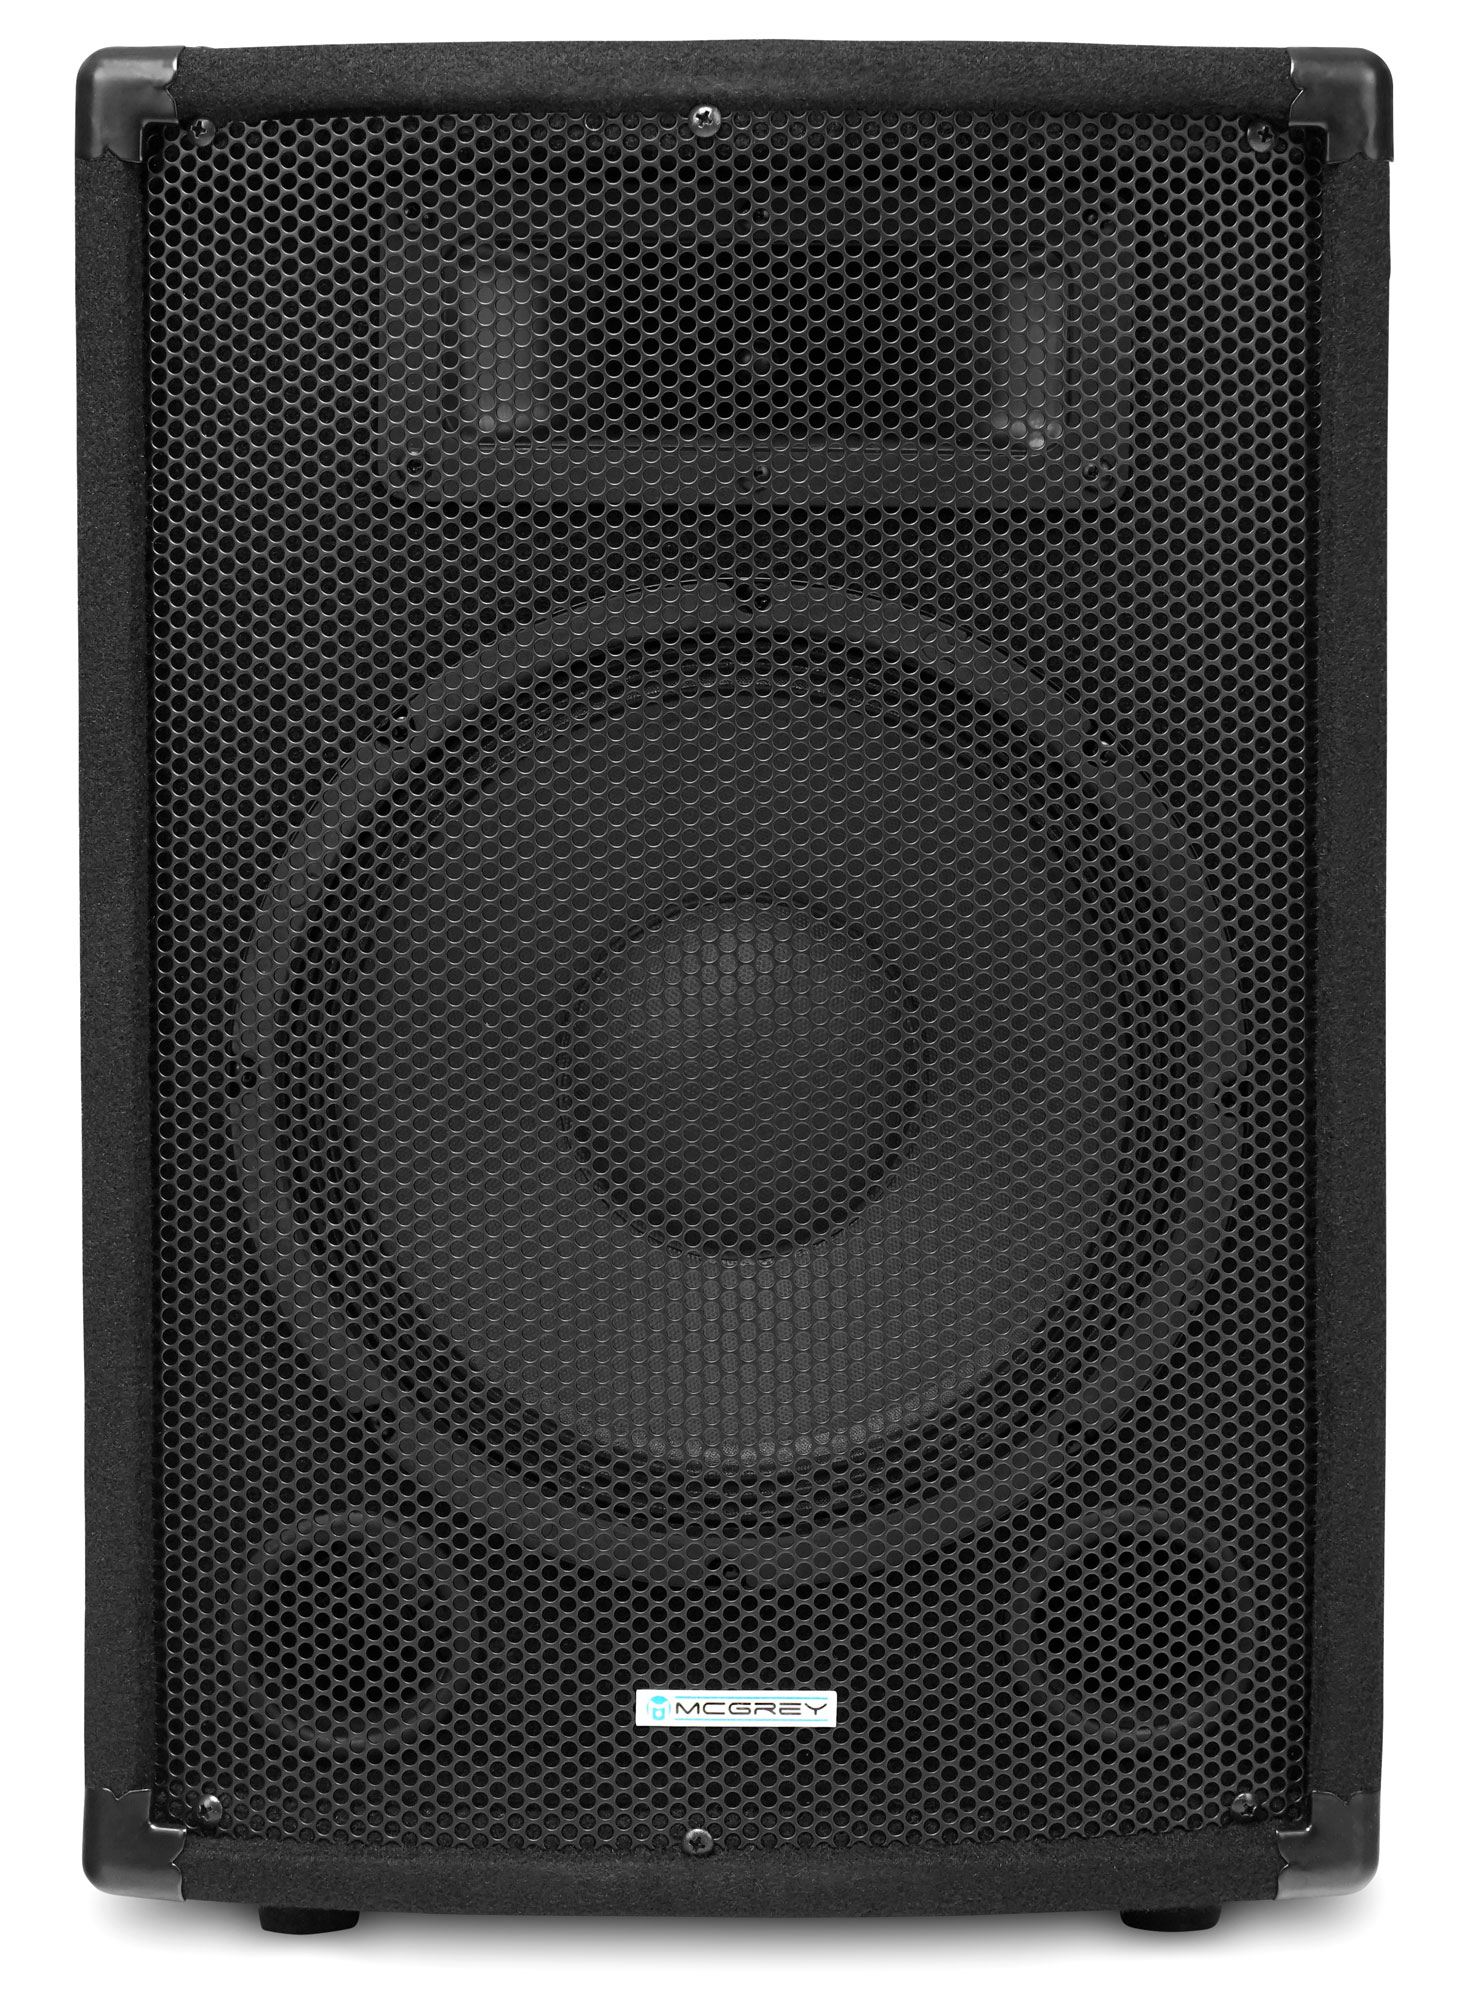 mcgrey pa set dj 01 2x tp 10 box 1x p152 e power amplifier 2x boxj1 5 cable 200w rms. Black Bedroom Furniture Sets. Home Design Ideas